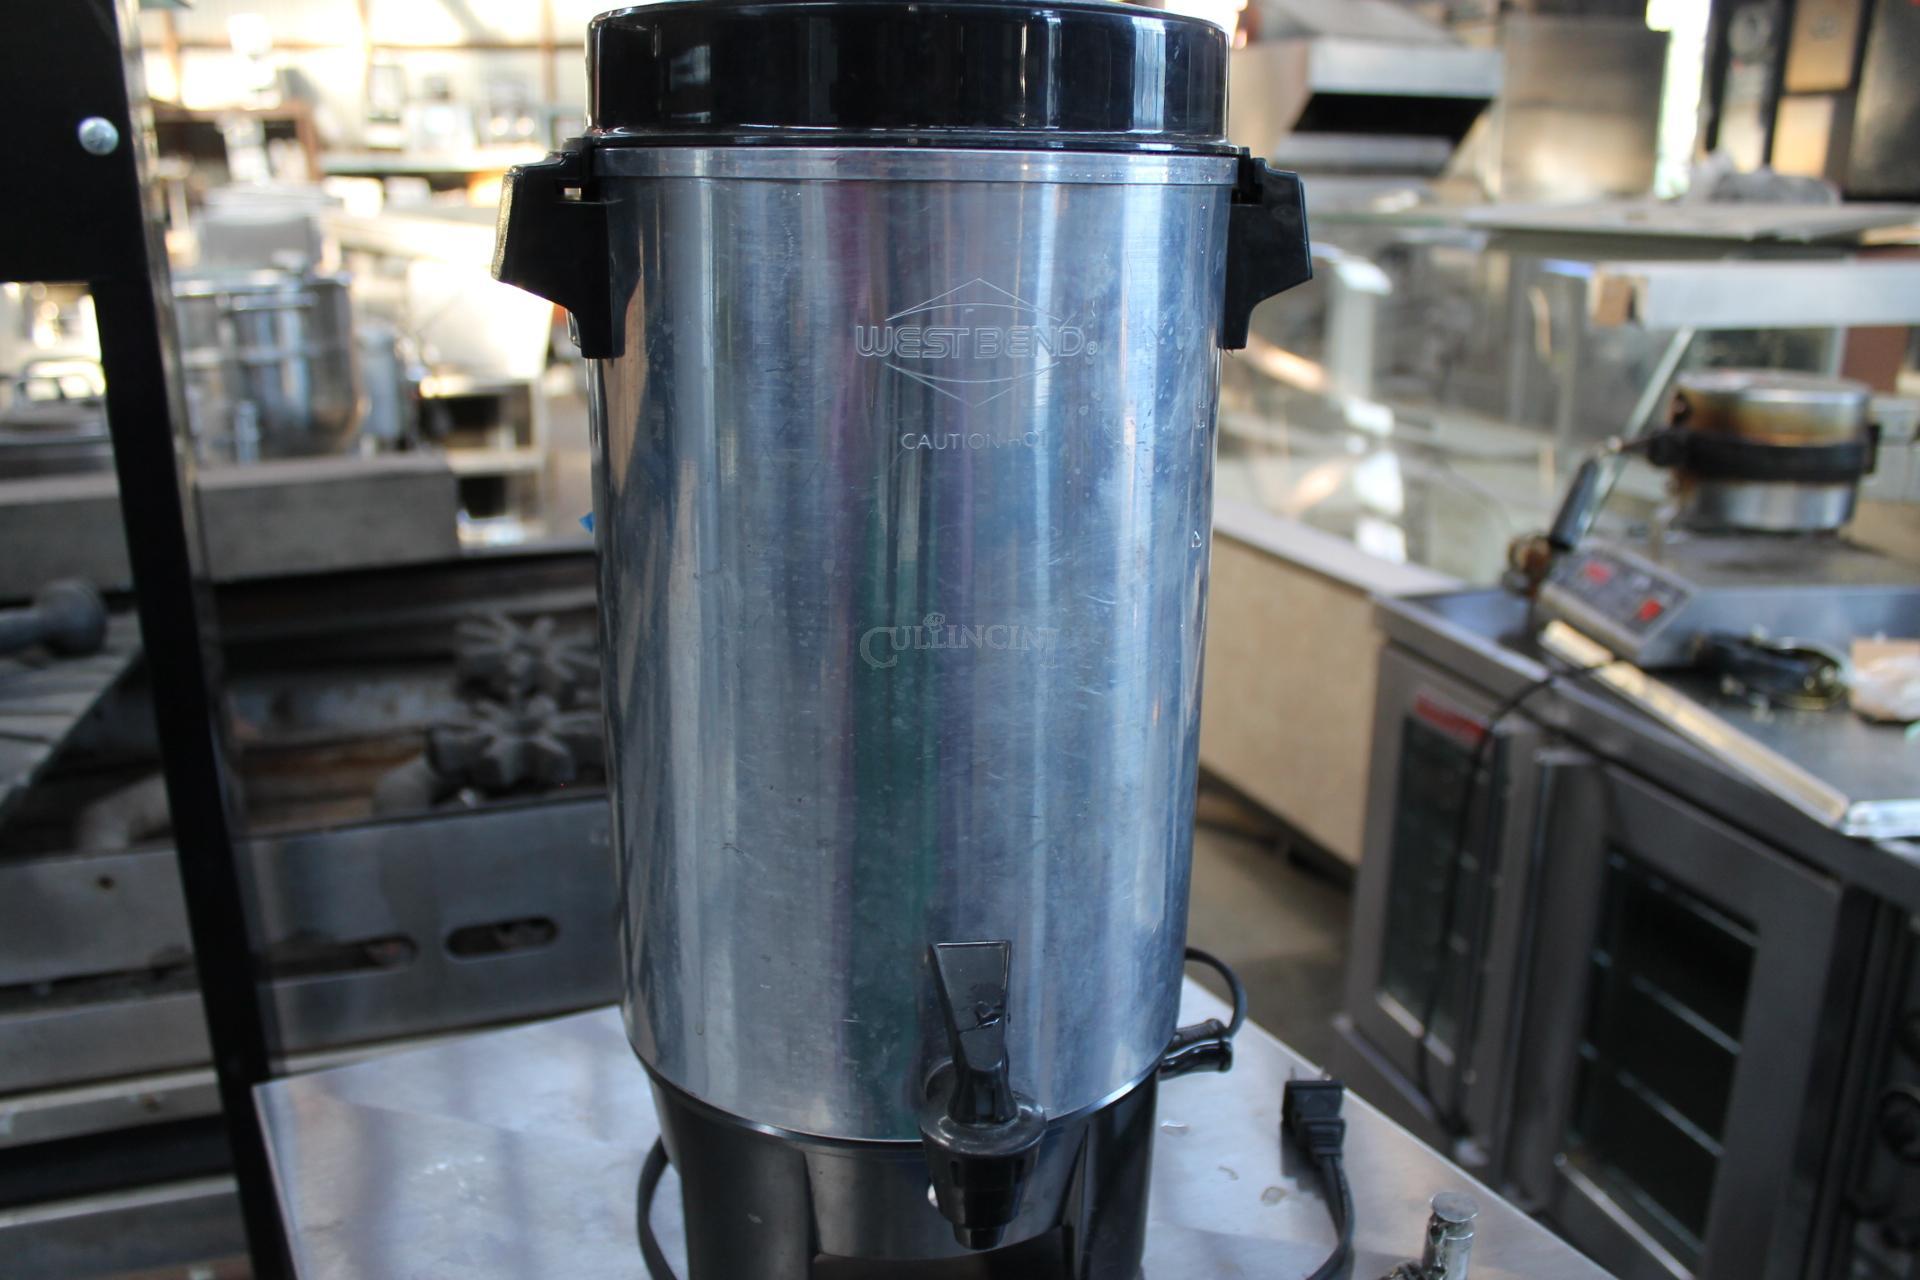 Used Coffee / Espresso Equipment